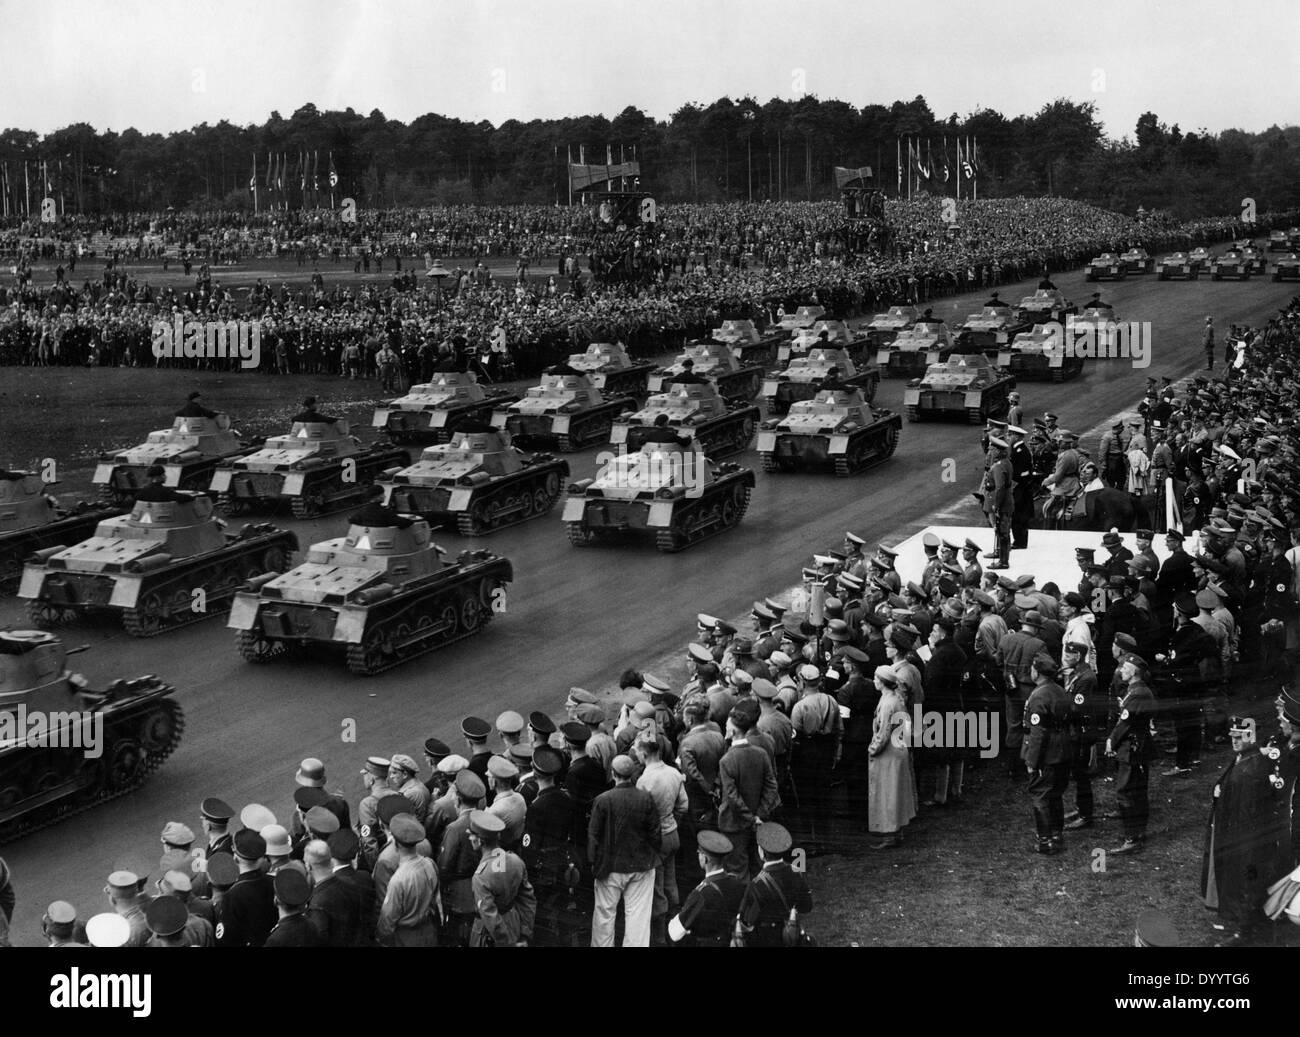 Tank parade at the 7th Nazi Party Congress, 1935 - Stock Image